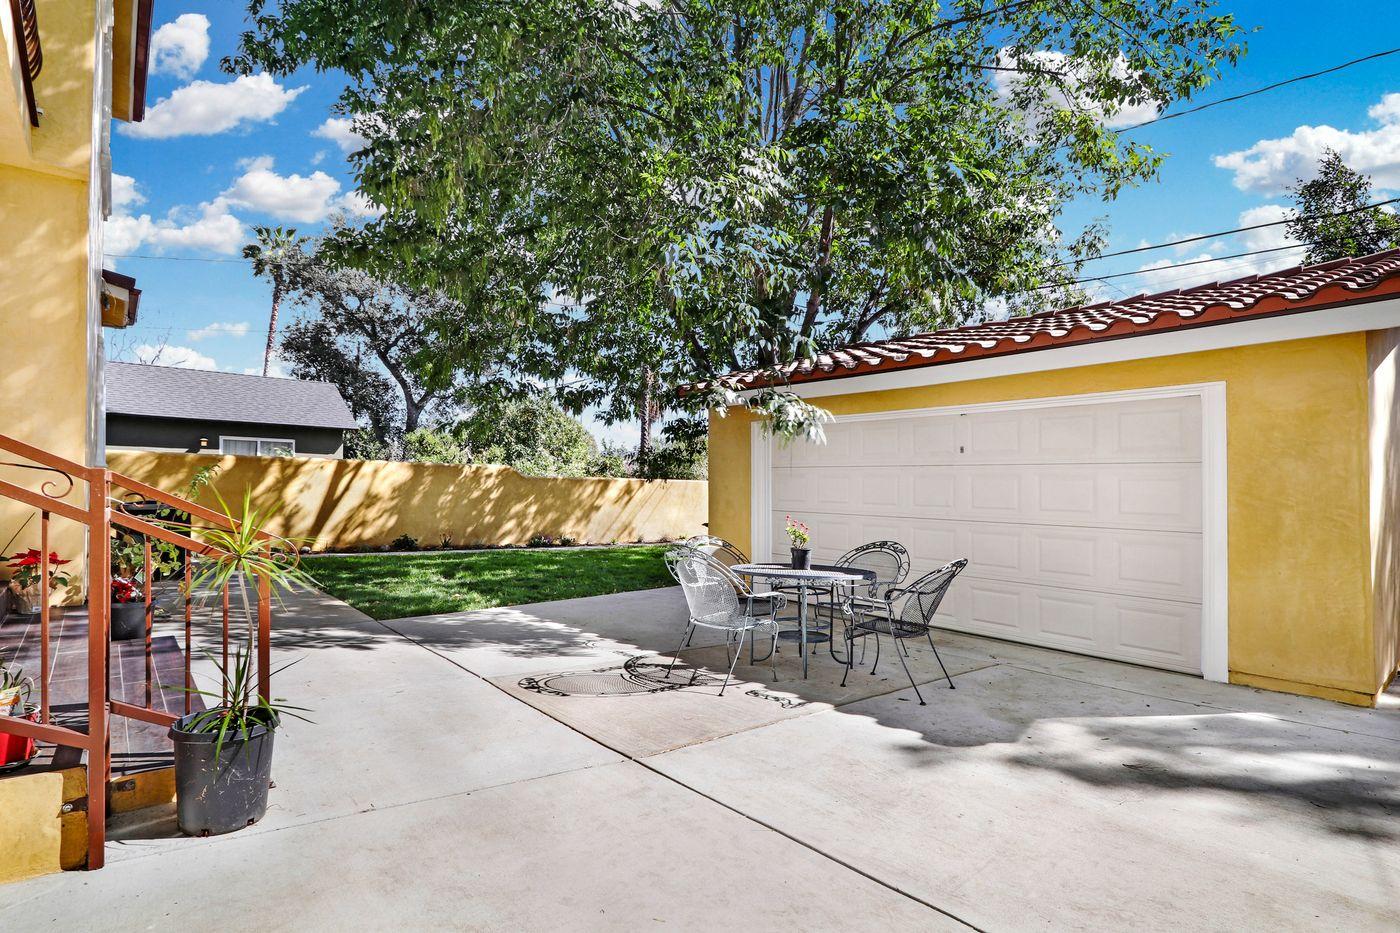 real-estate-photography-los-angeles-pasadena-glendale-burbank-AD-photographer-23